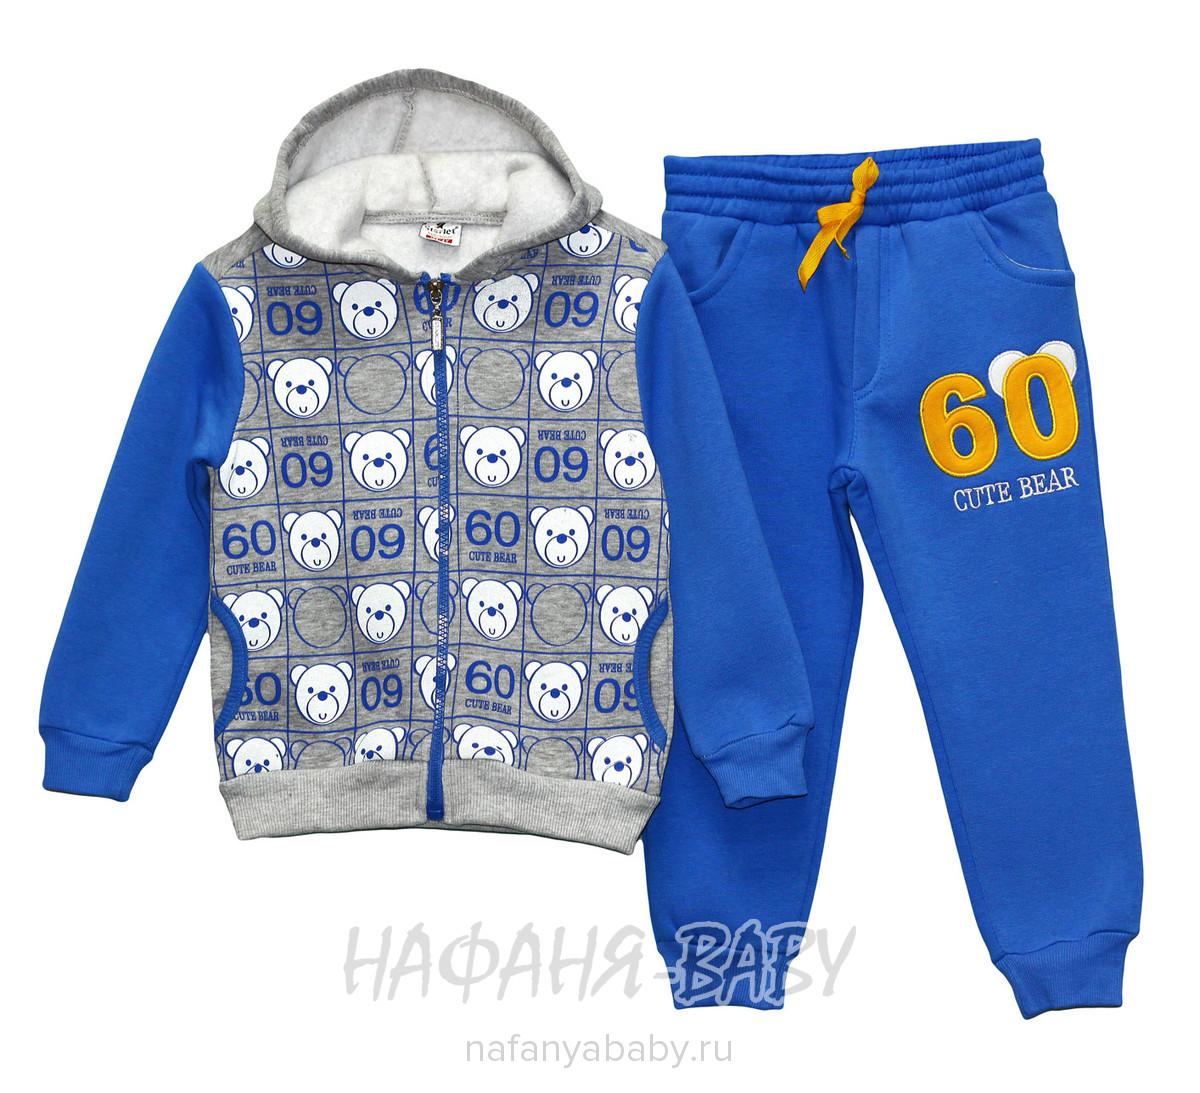 Детский костюм (кофта+брюки) STARLET арт: 2864, 1-4 года, оптом Турция